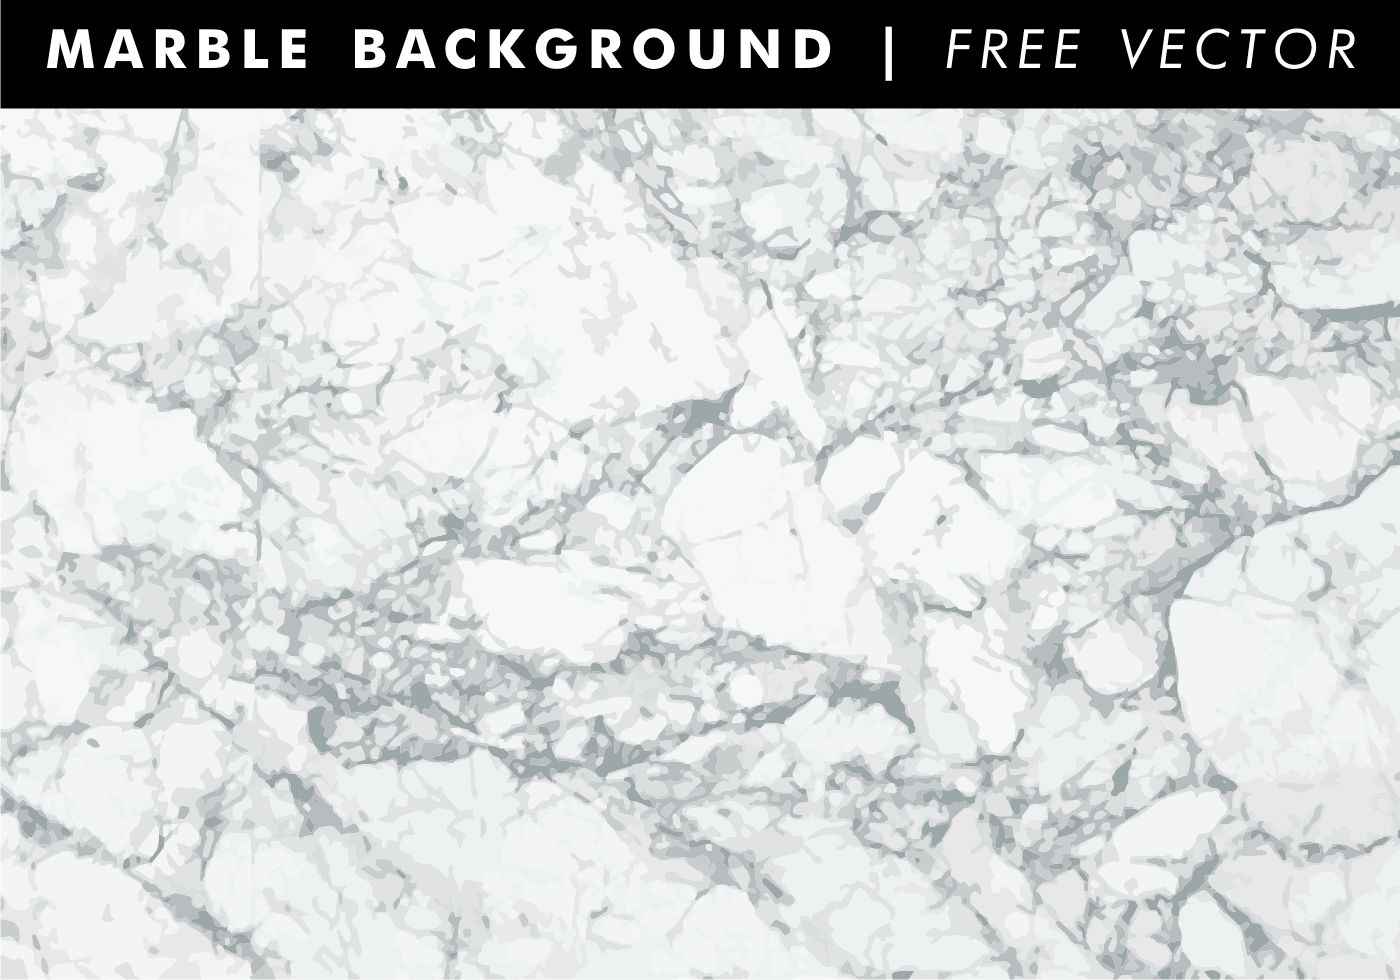 1400x980 Marble Wallpaper Free Vector Art